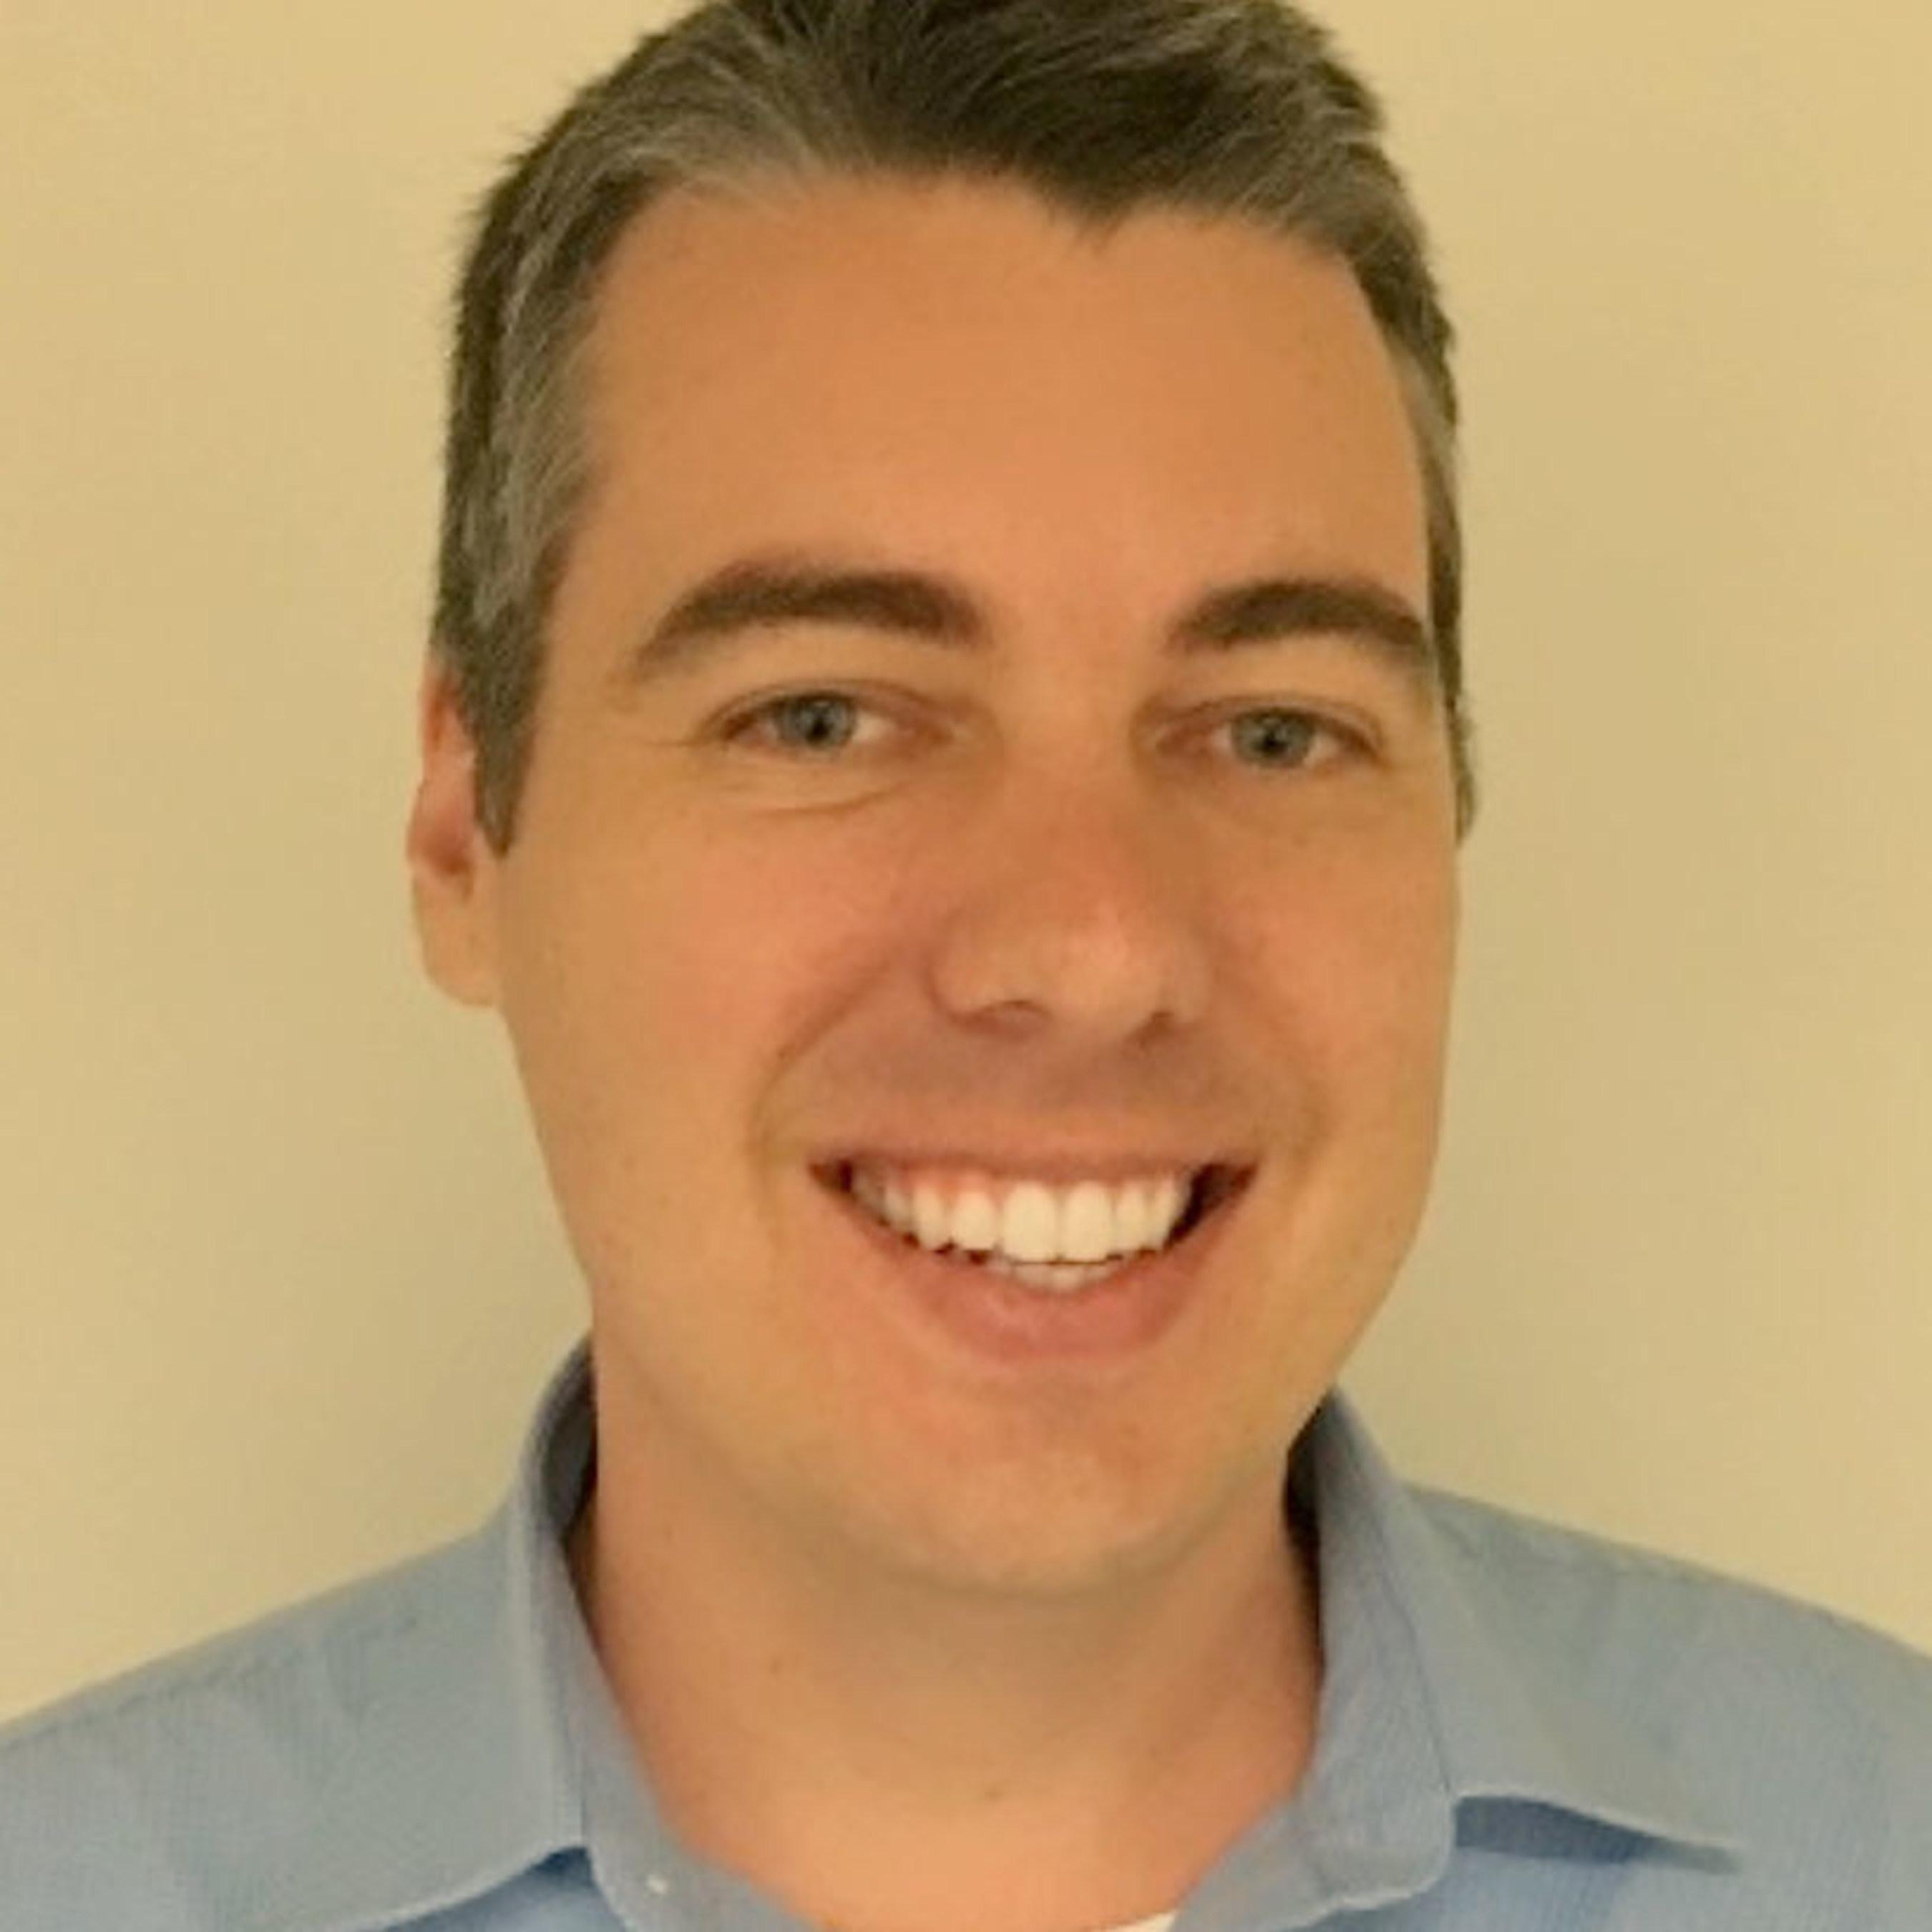 Australian Start-up Finds the Secret to Good Project Management